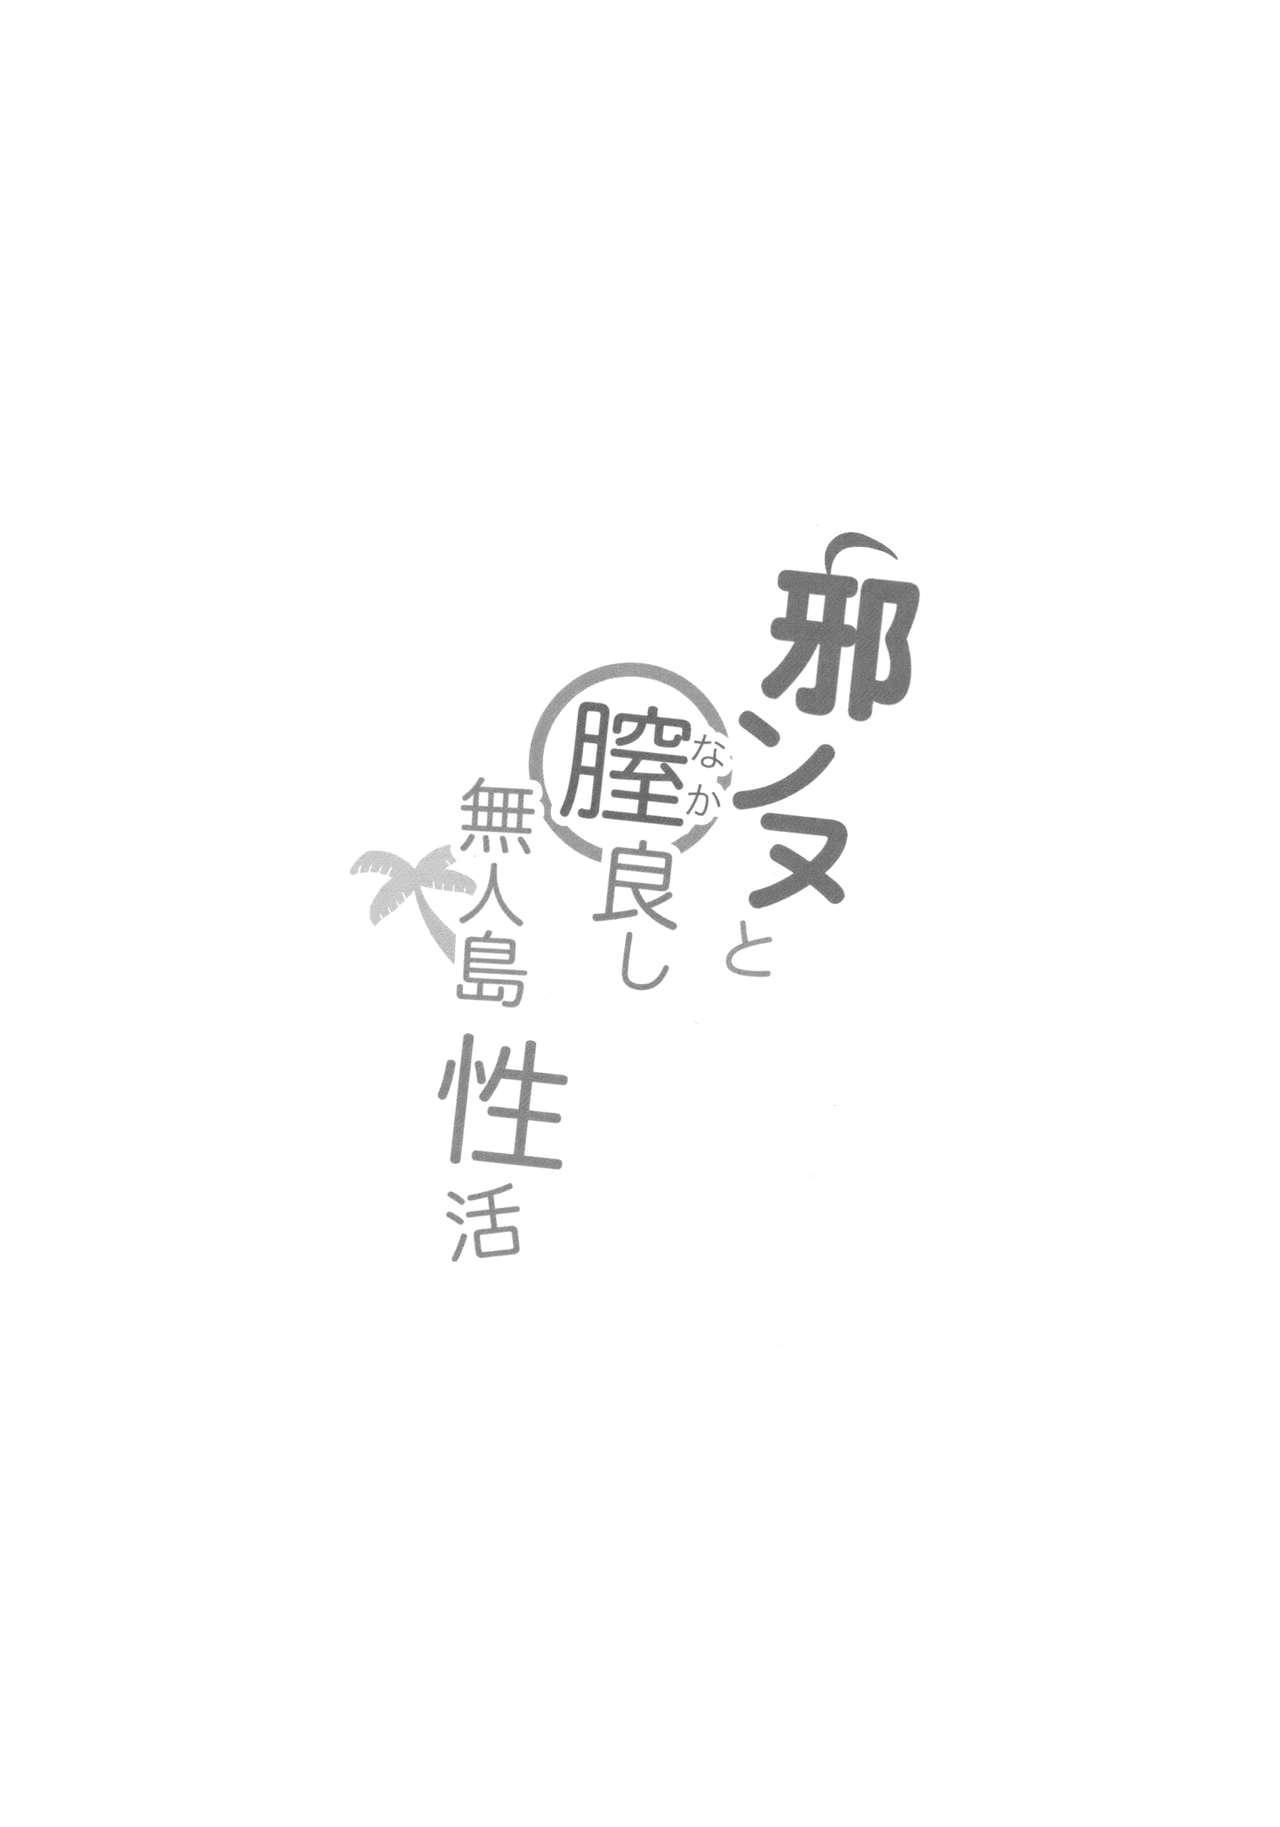 Jeanne to Nakayoshi Mujintou Seikatsu | My daily life on an uninhabited island with Jeanne. 2